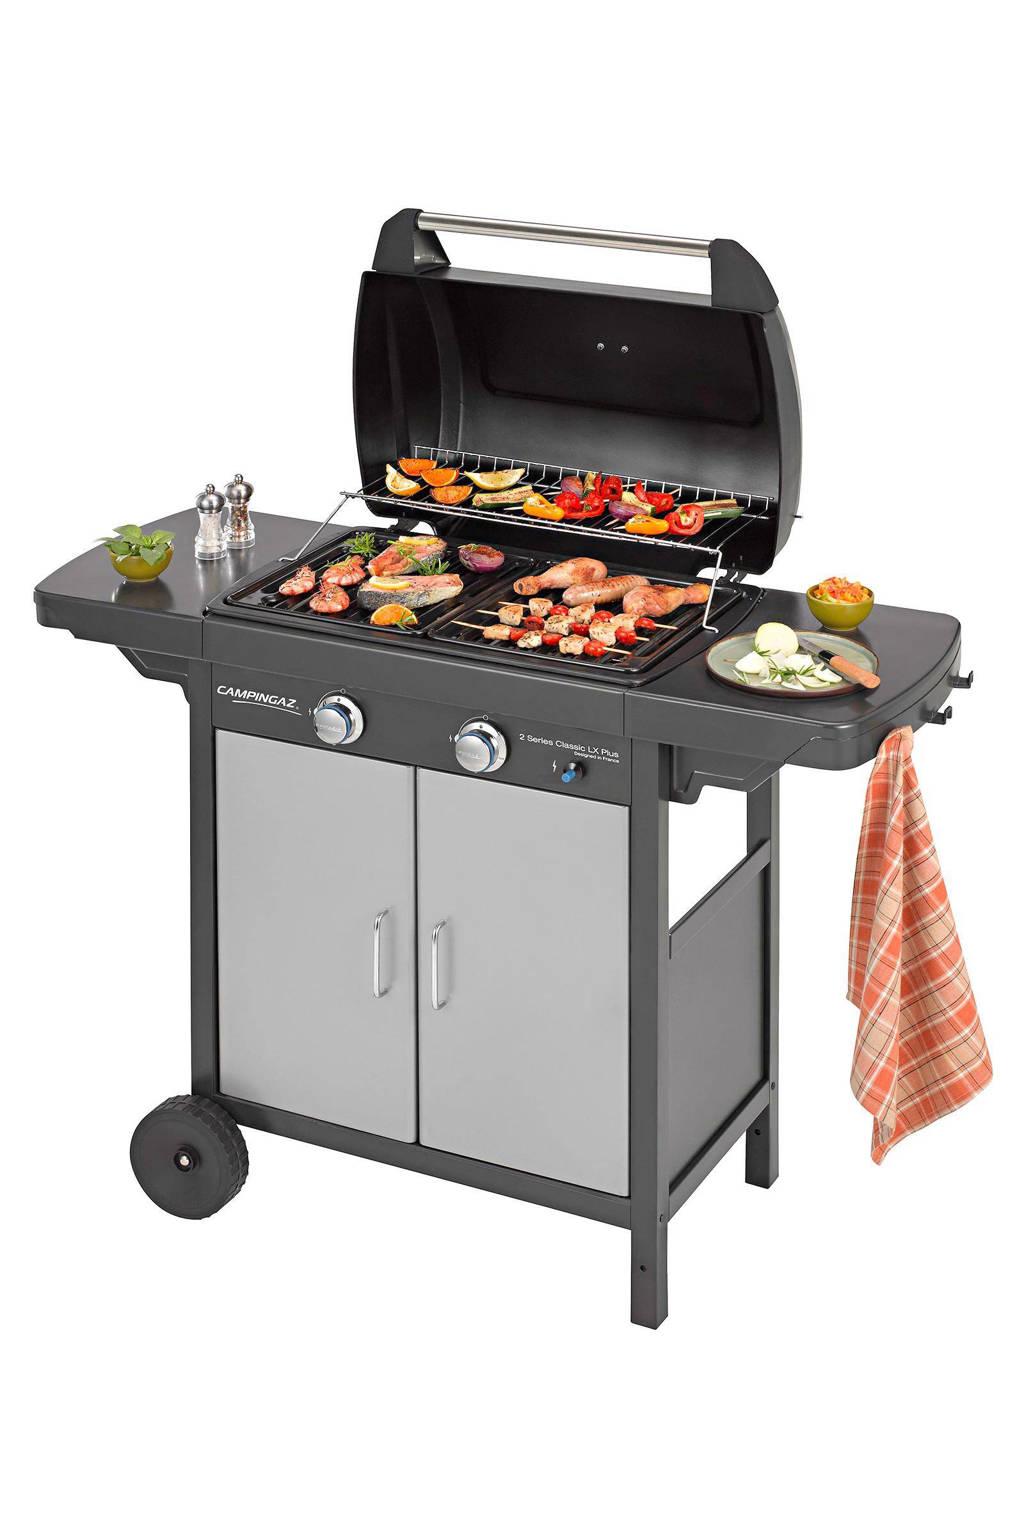 Campingaz 2 Series Classic LX Plus gasbarbecue, 2 series Classic LX plus, Grijs